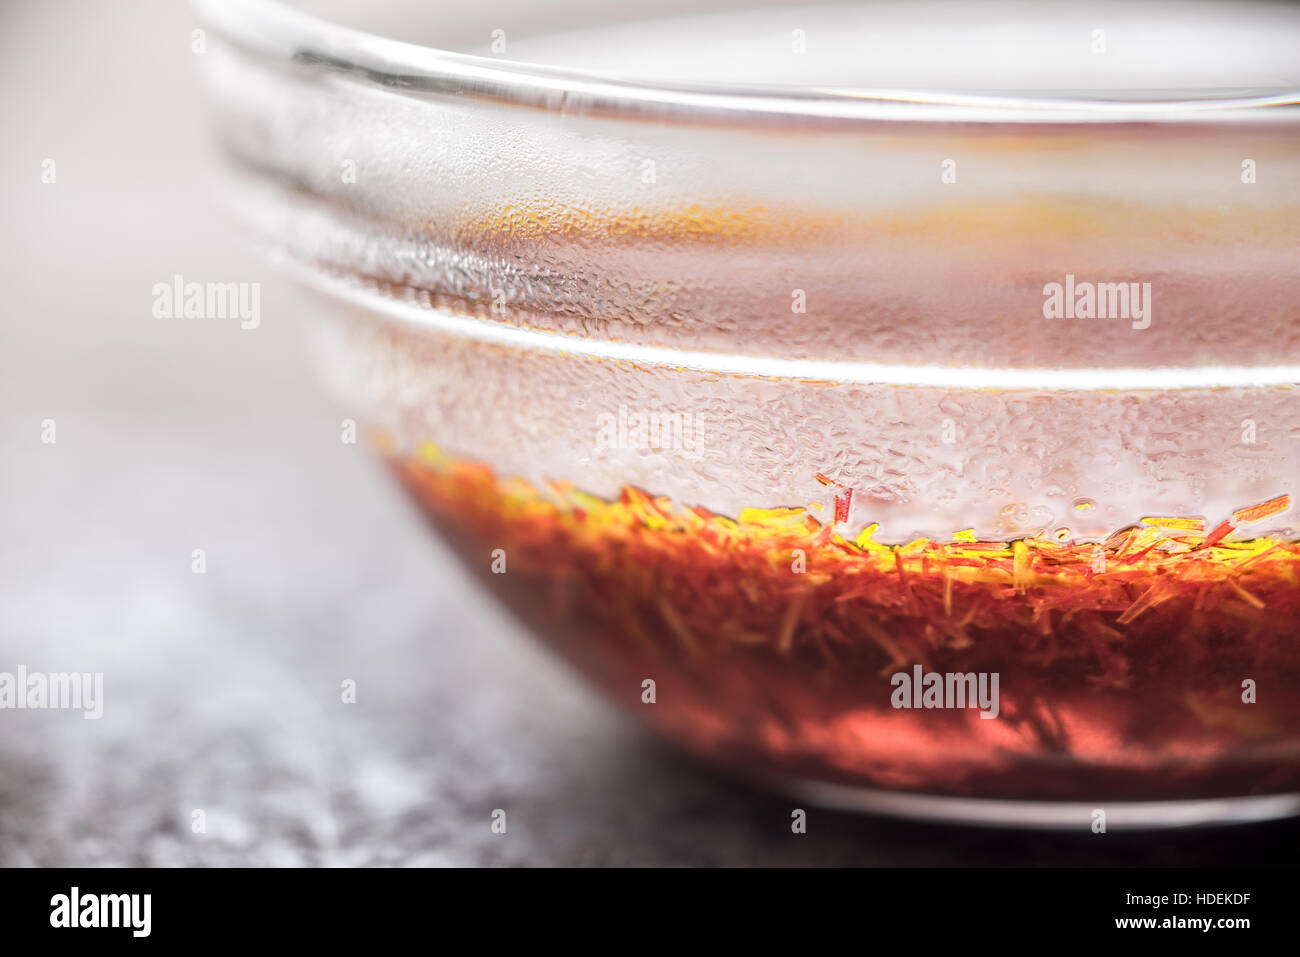 Saffron in the glass bowl horizontal - Stock Image